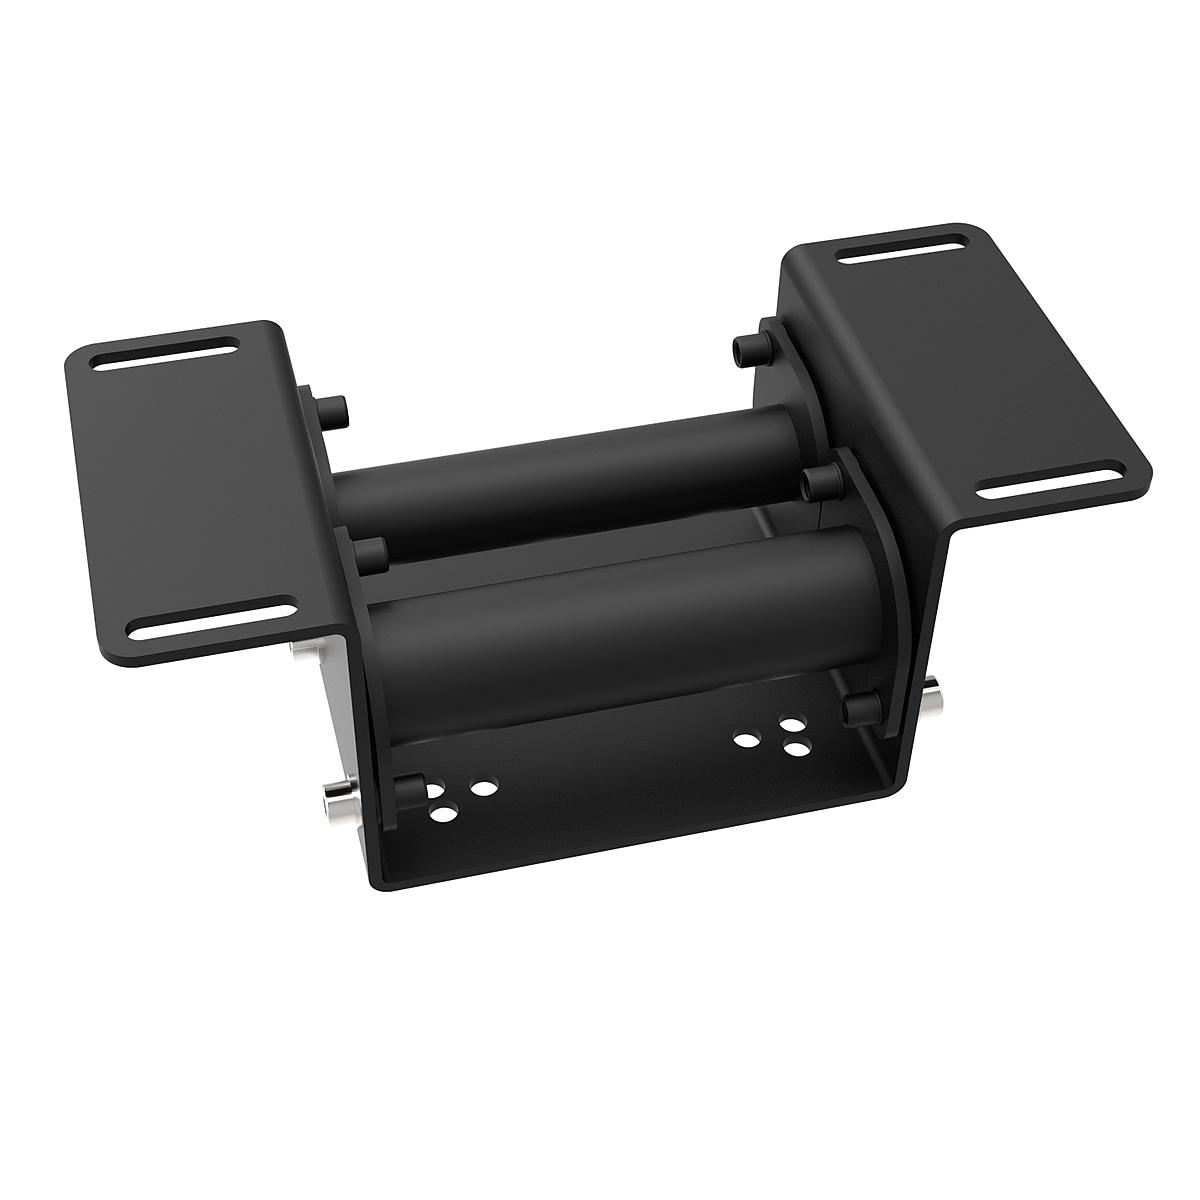 B1 / P1 / C1 Buttkicker mount Upgrade kit Black